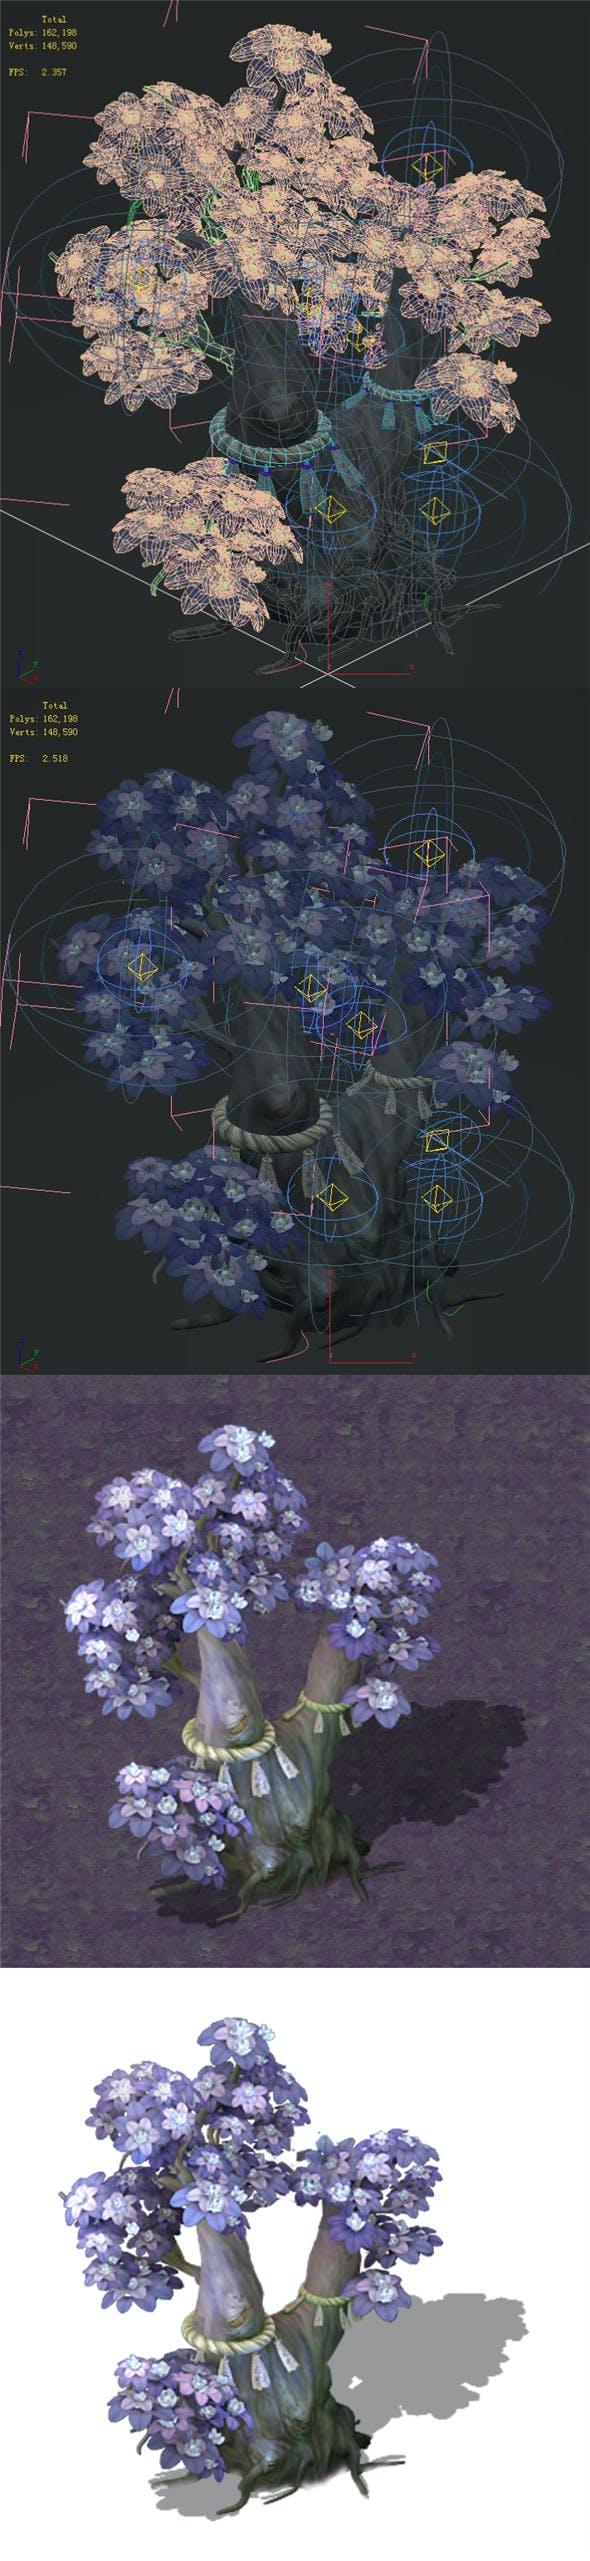 Cartoon hell - soul Flower tree 05 - 3DOcean Item for Sale